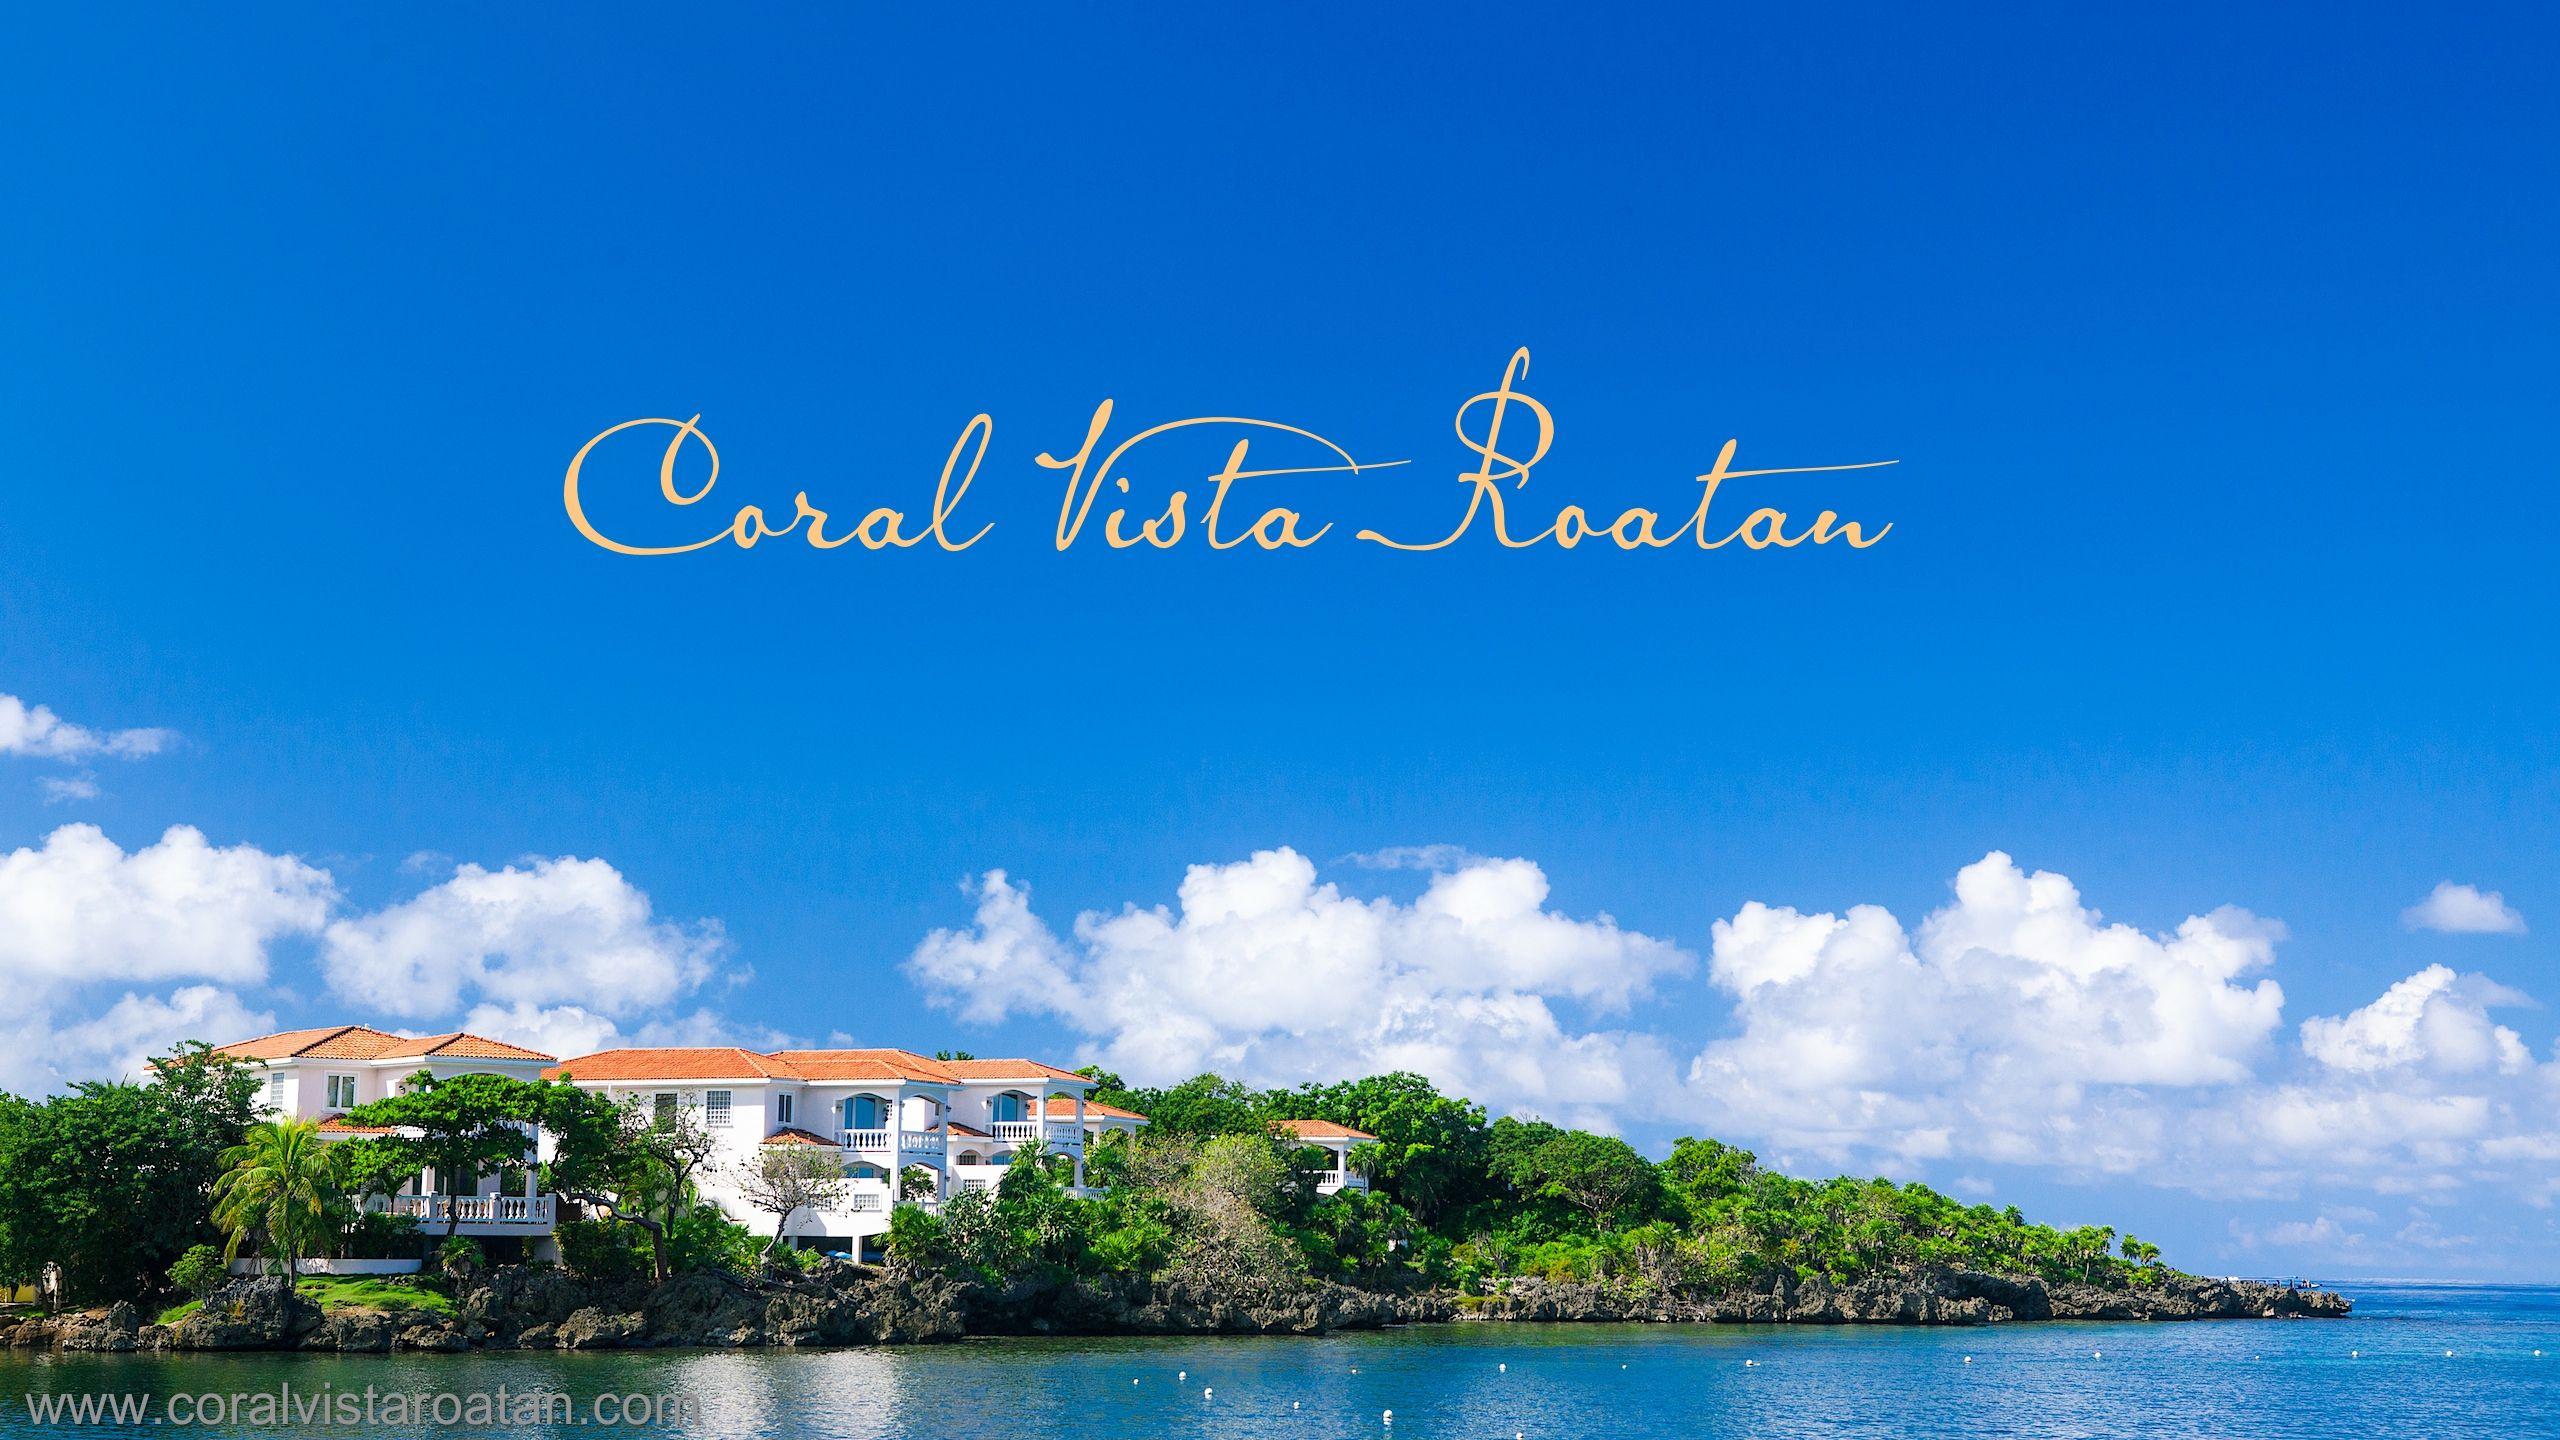 Better than roatan honduras resorts the coral vista